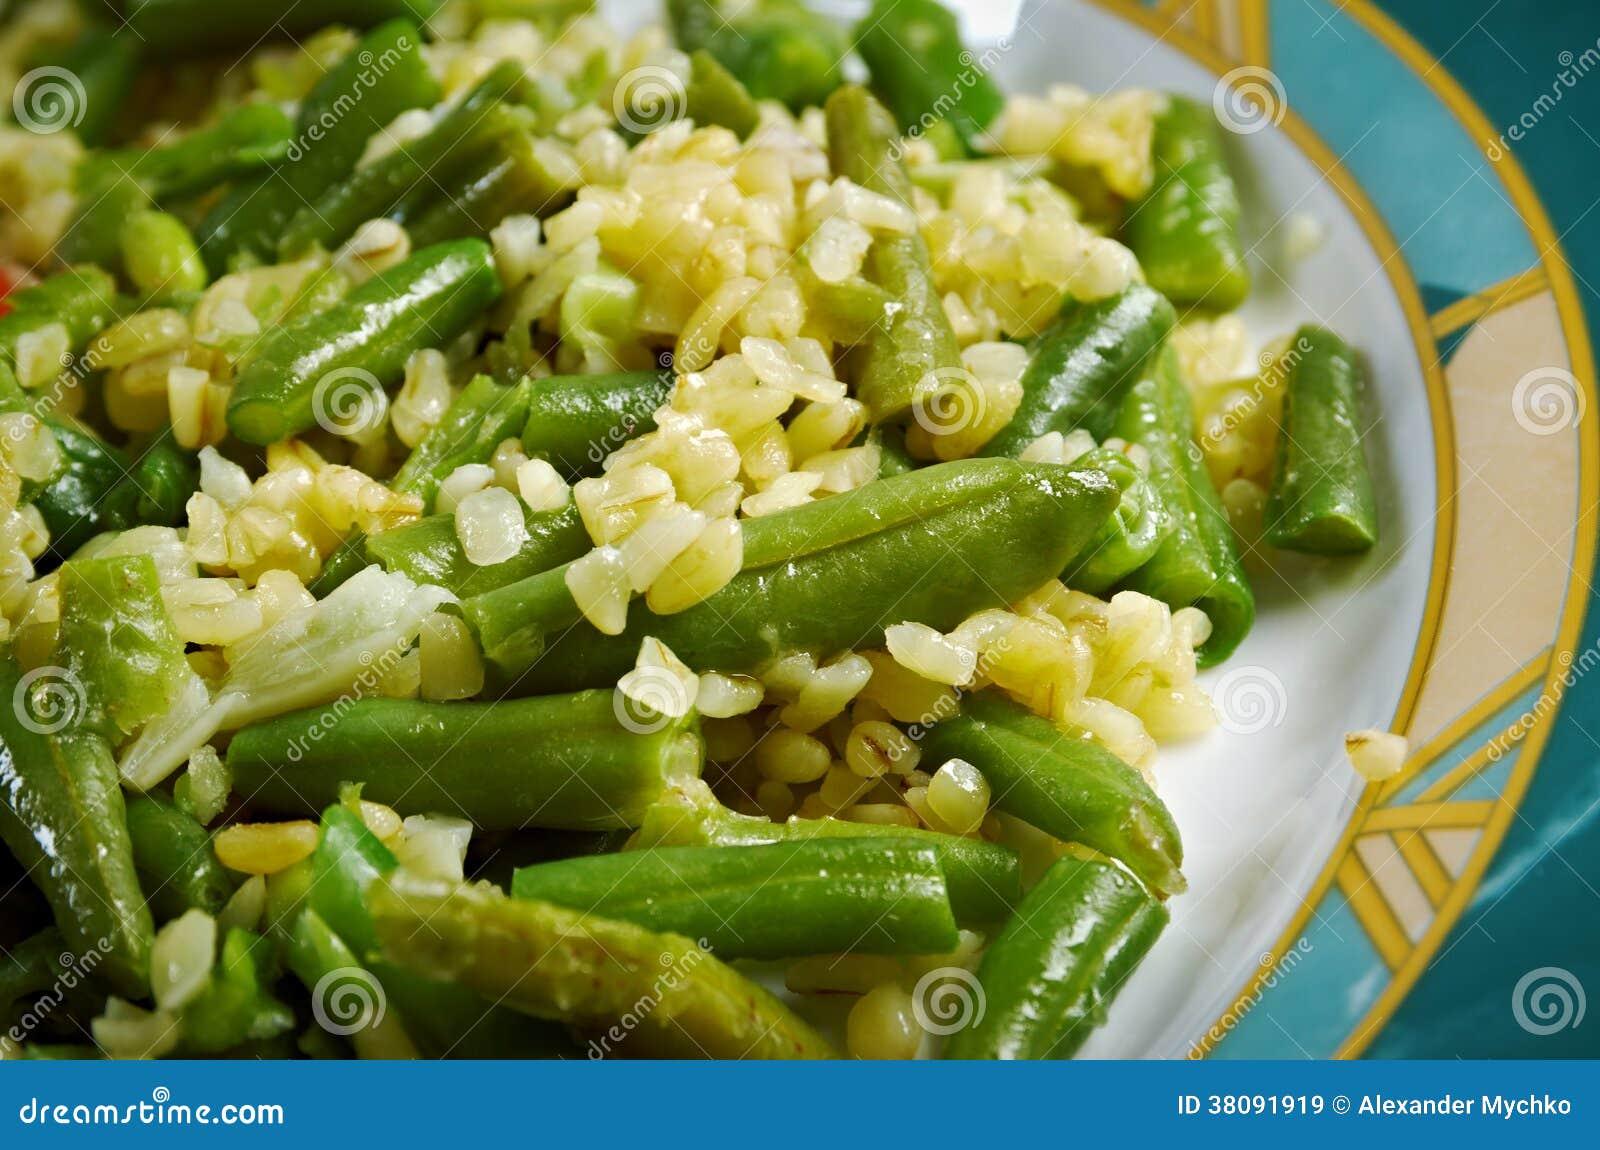 salade de haricots verts images libres de droits image 38091919. Black Bedroom Furniture Sets. Home Design Ideas